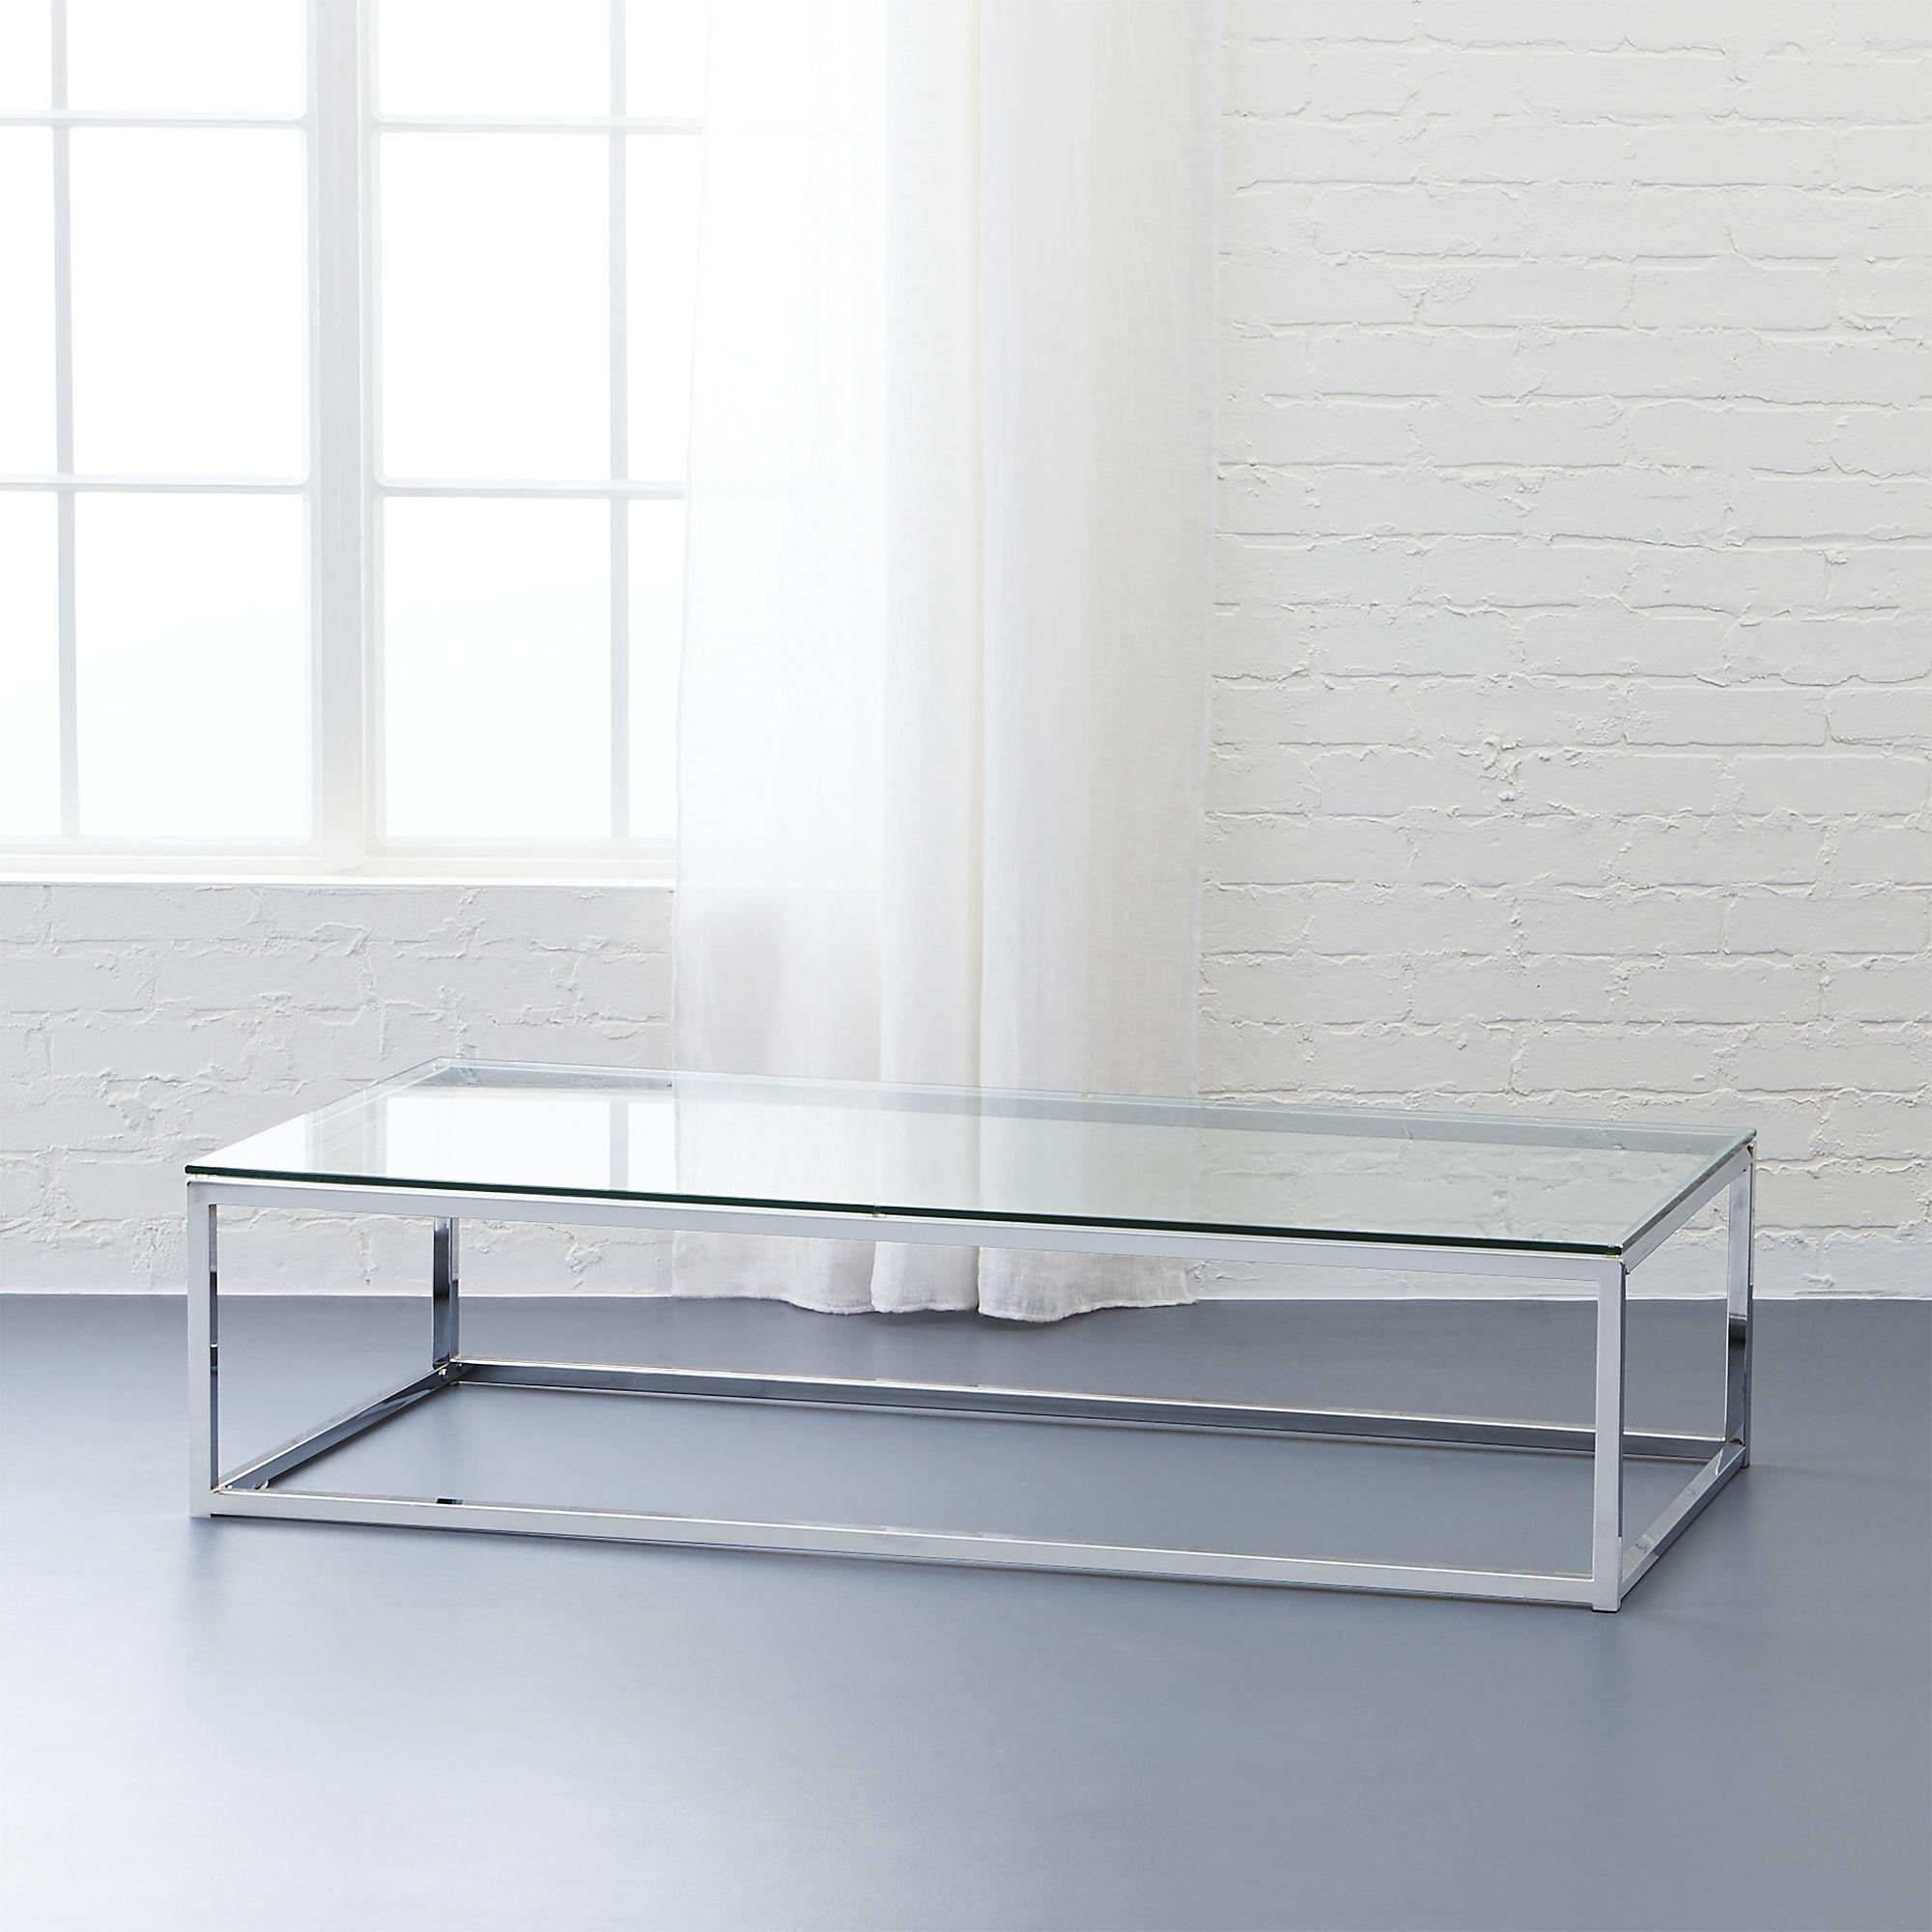 smart glass top coffee table  Glass top coffee table, Coffee